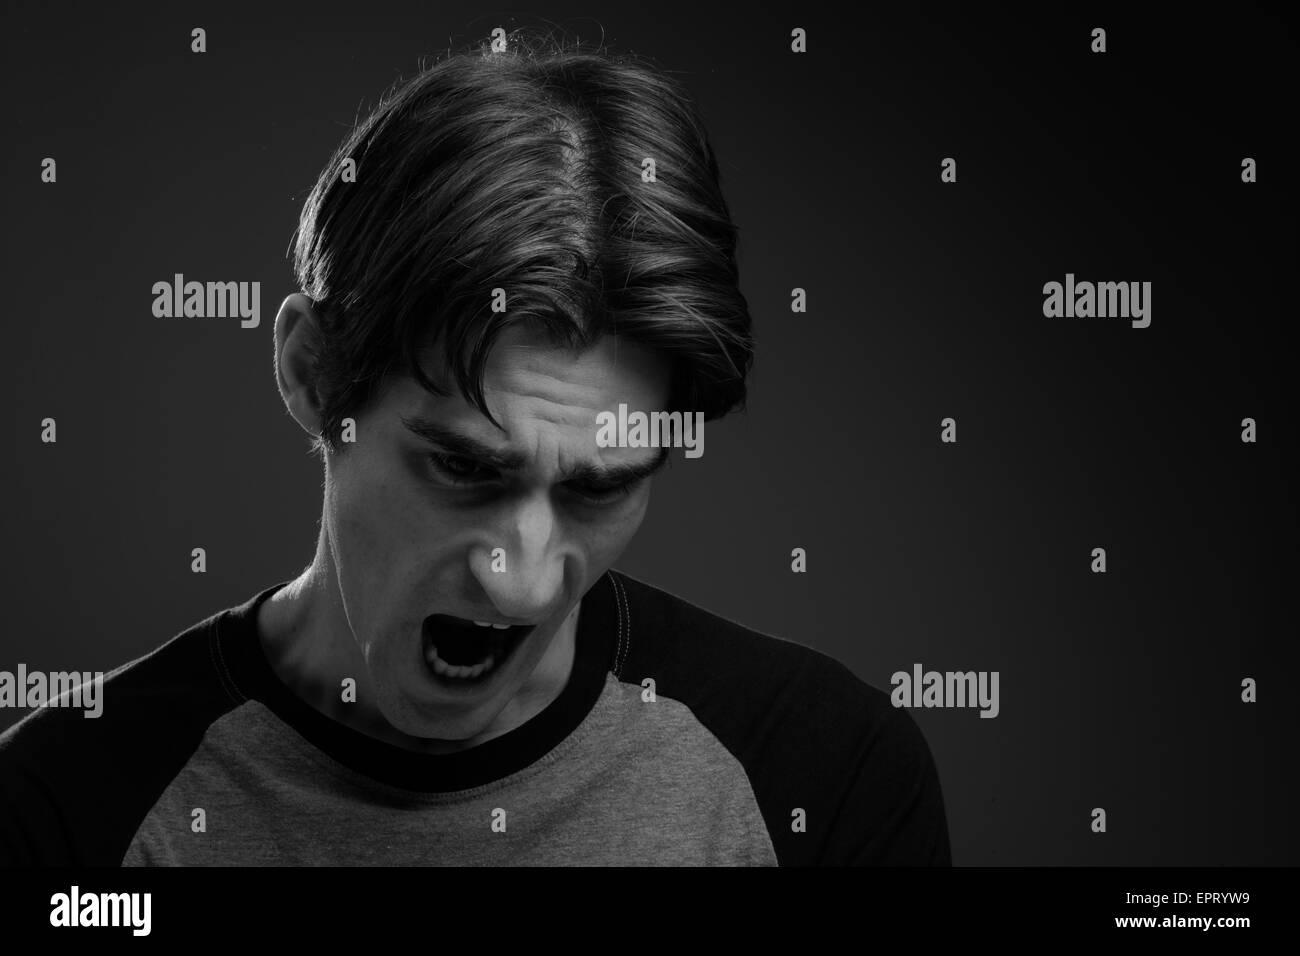 Furious model screaming - Stock Image